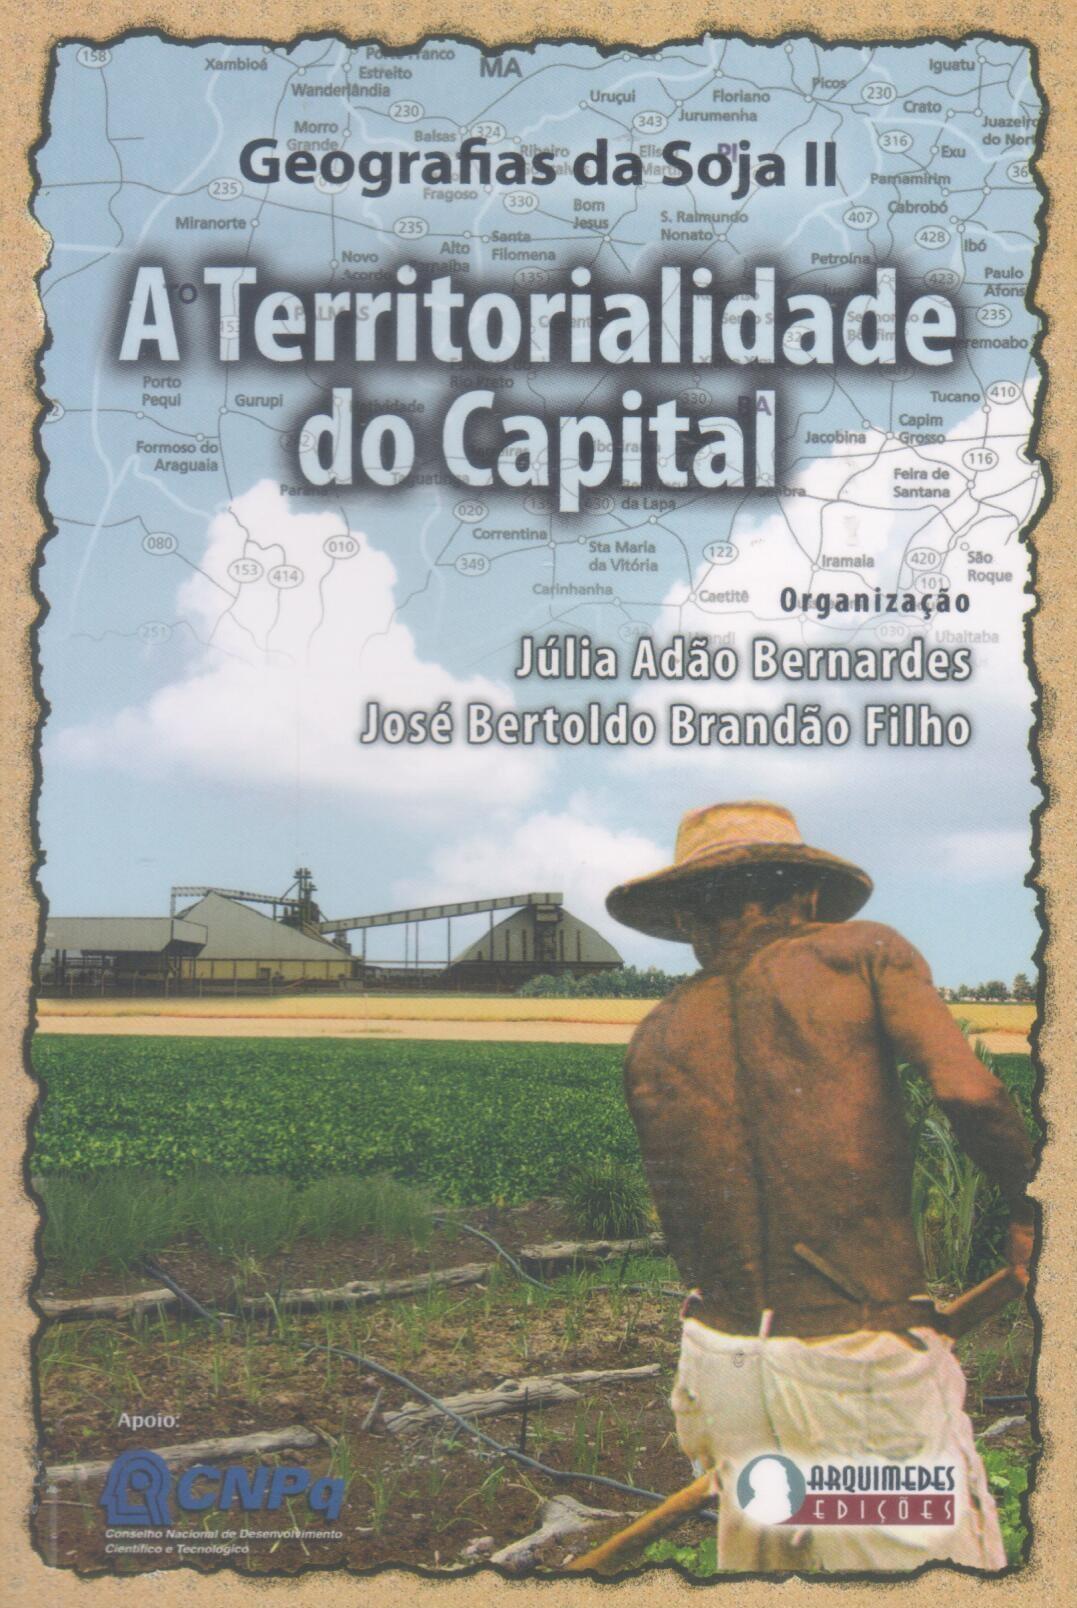 Geografias da soja II a territorialidade do capital